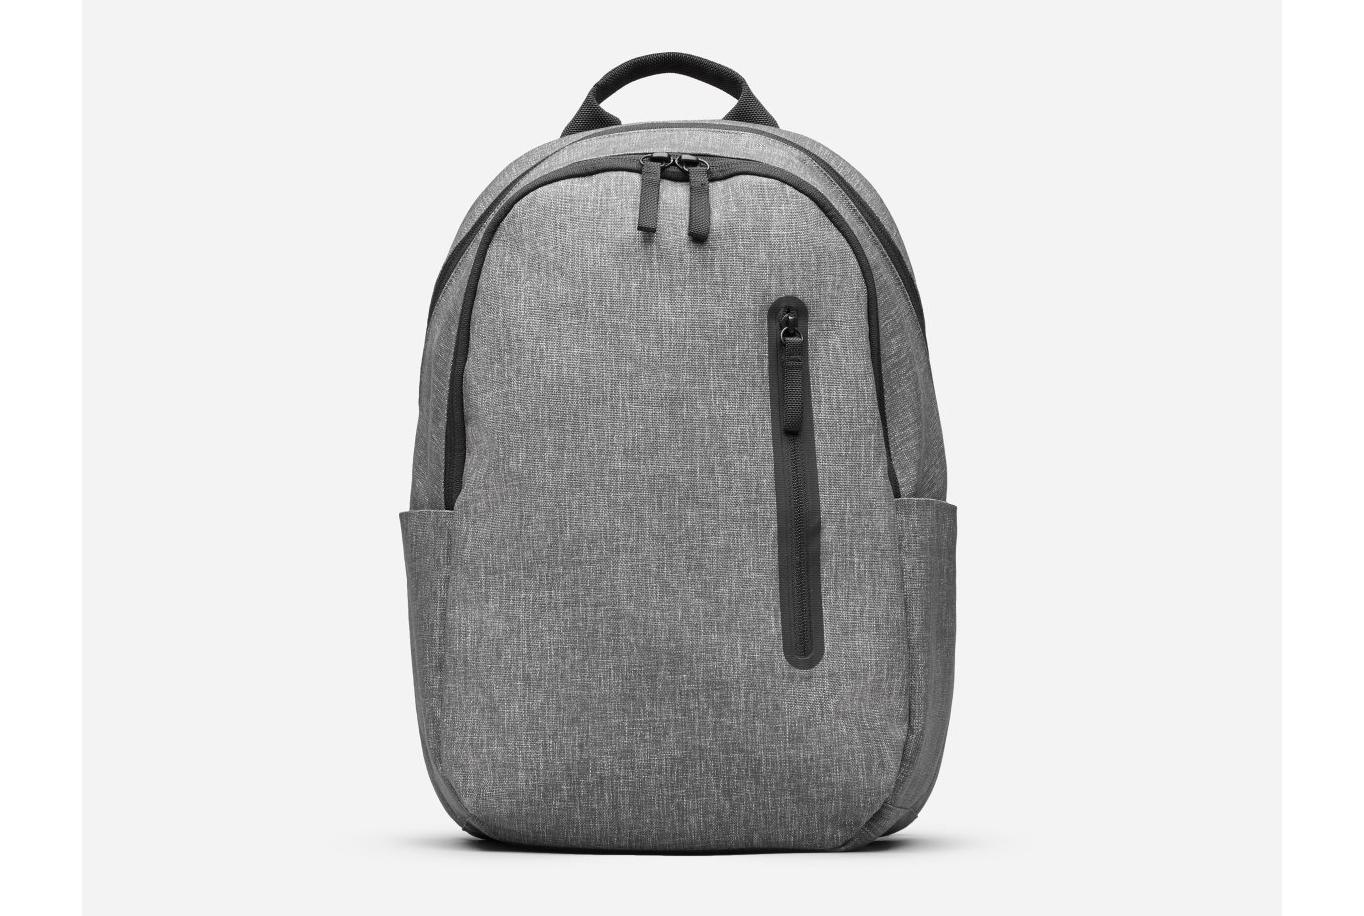 The Nylon Commuter Backpack